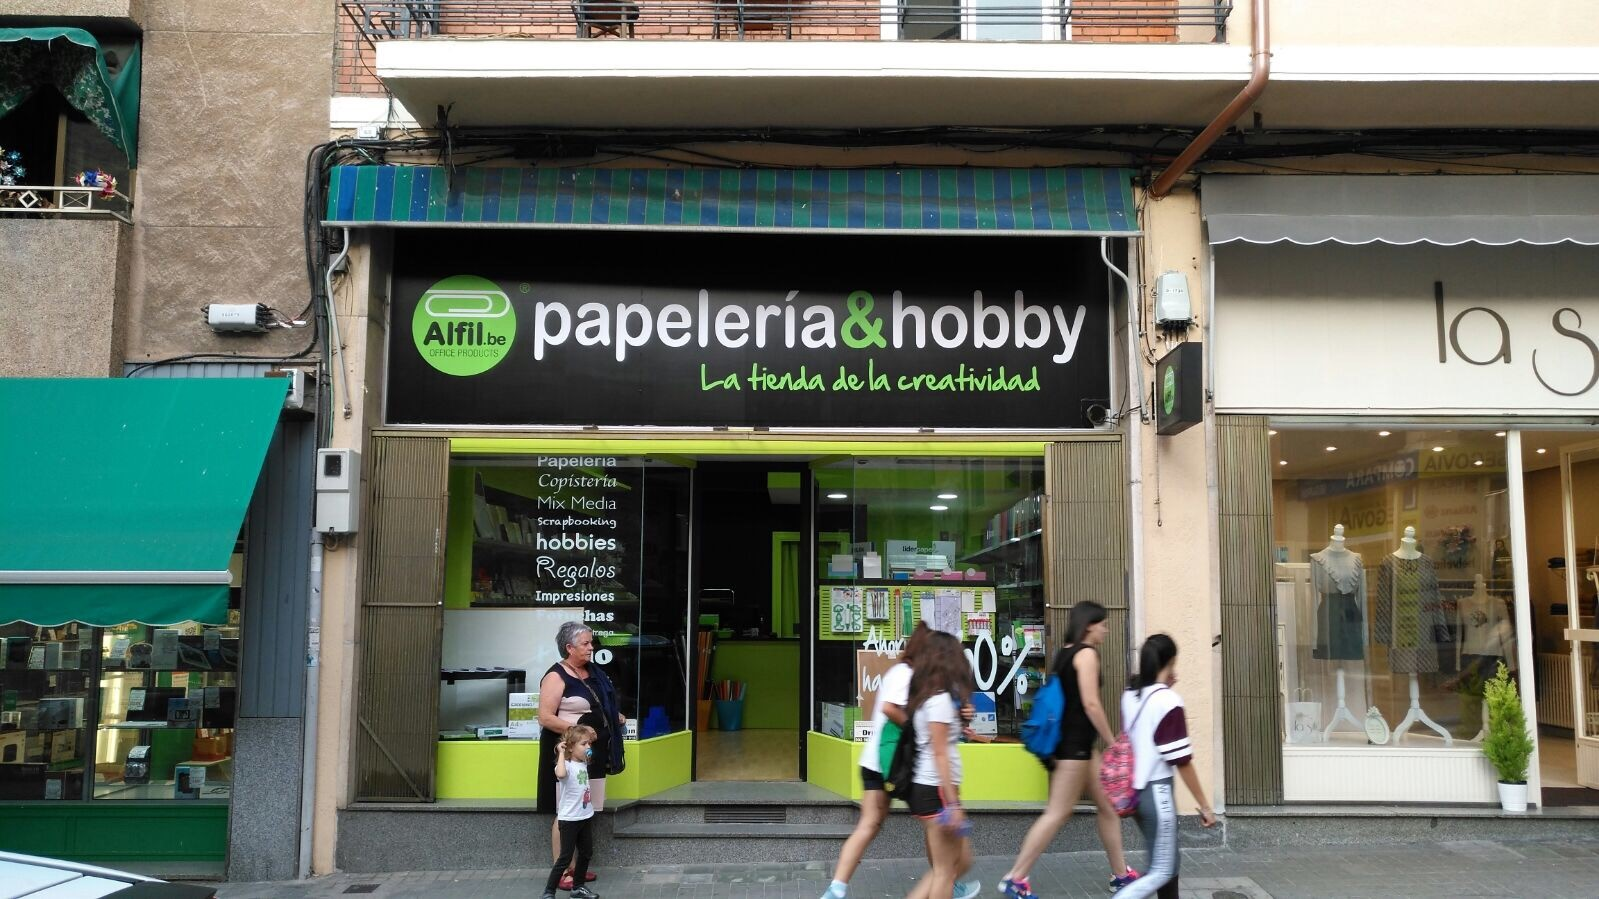 Alfil.be papeleria & hobby inaugura en Segovia